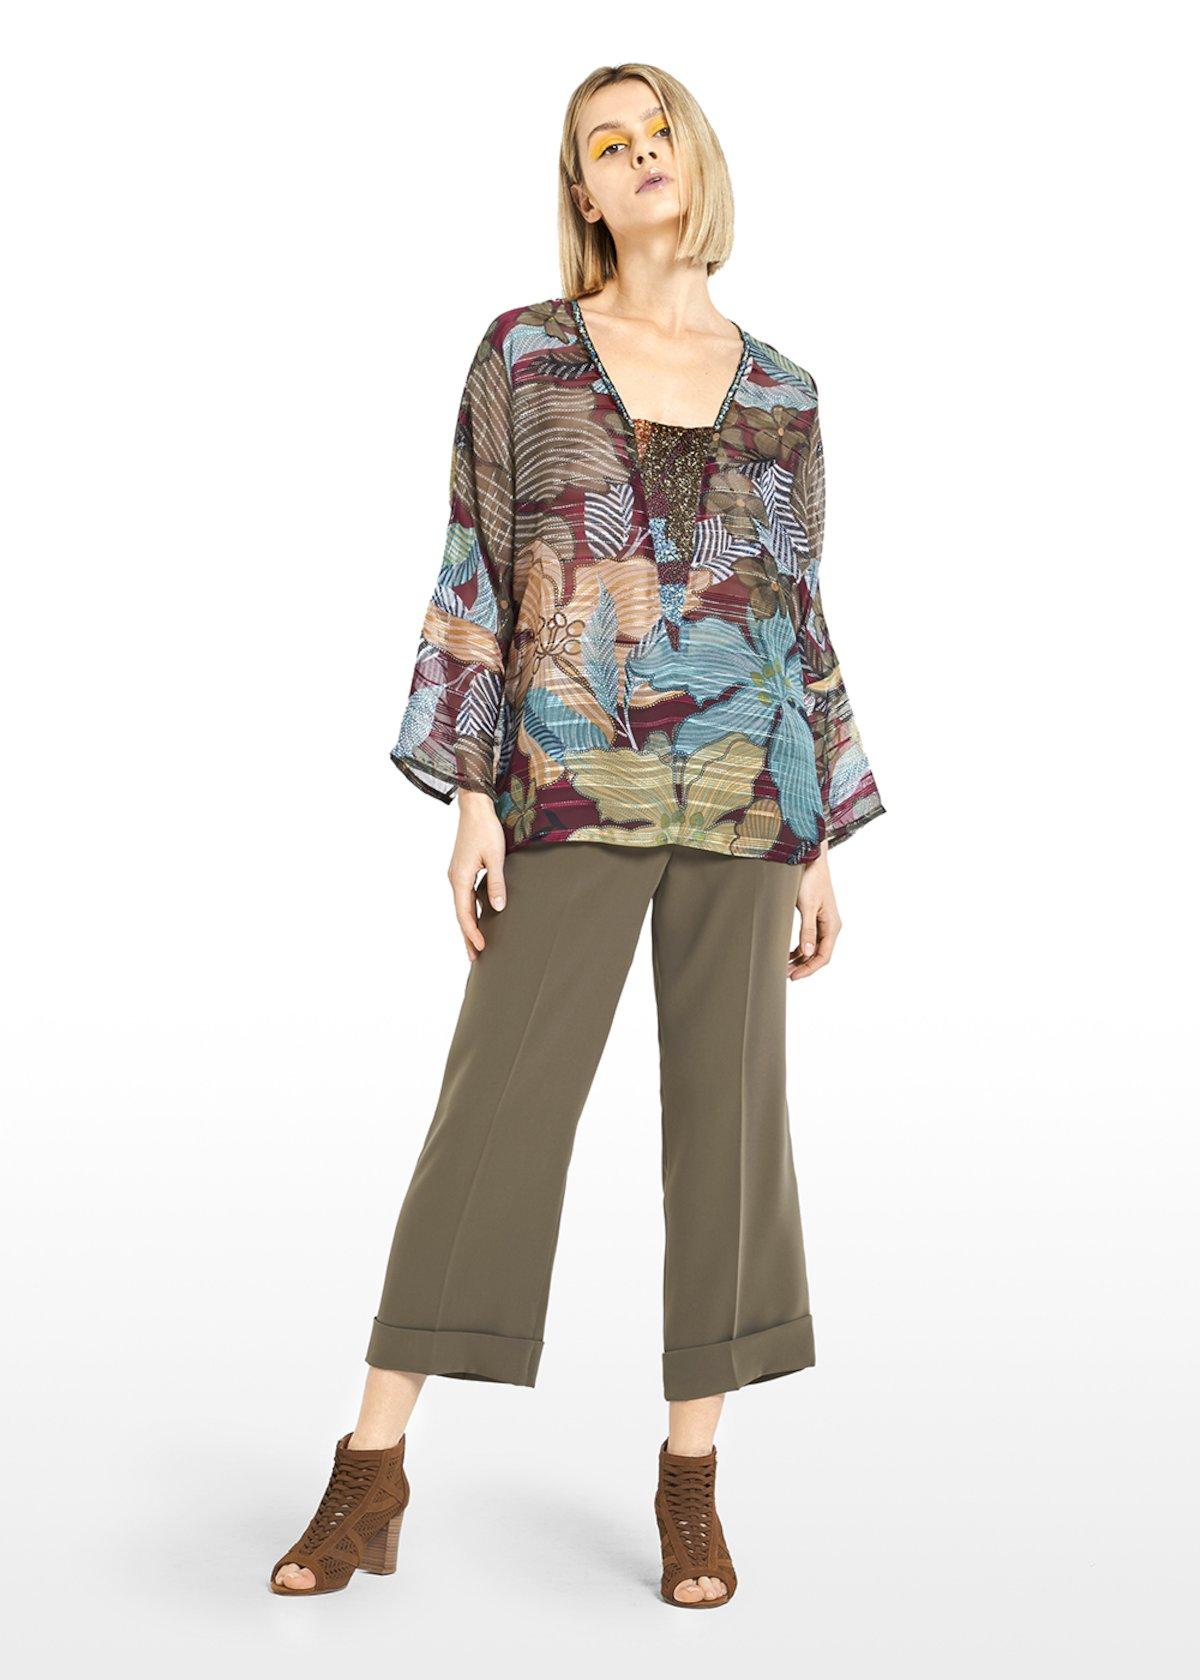 Cristel georgette blouse embroidered at the neck - Alga\ Morello\ Fantasia - Woman